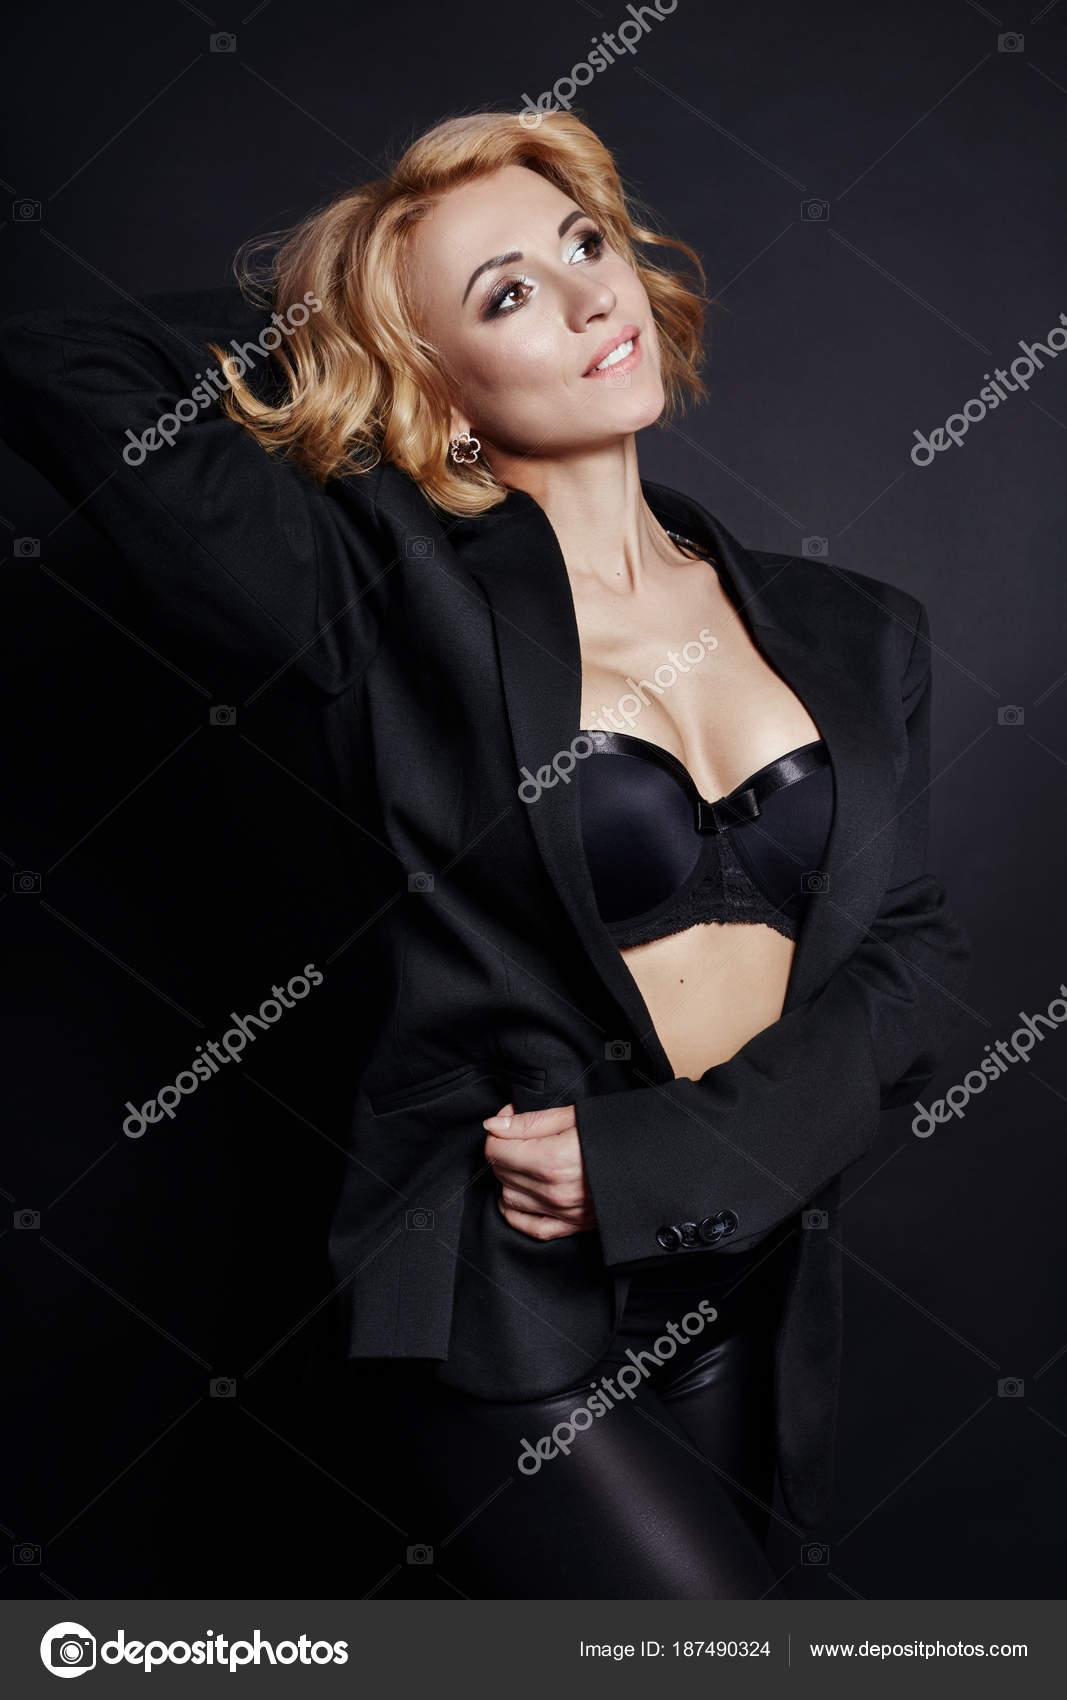 sexy nudo nero ragazze fotolattice Angelo pompino